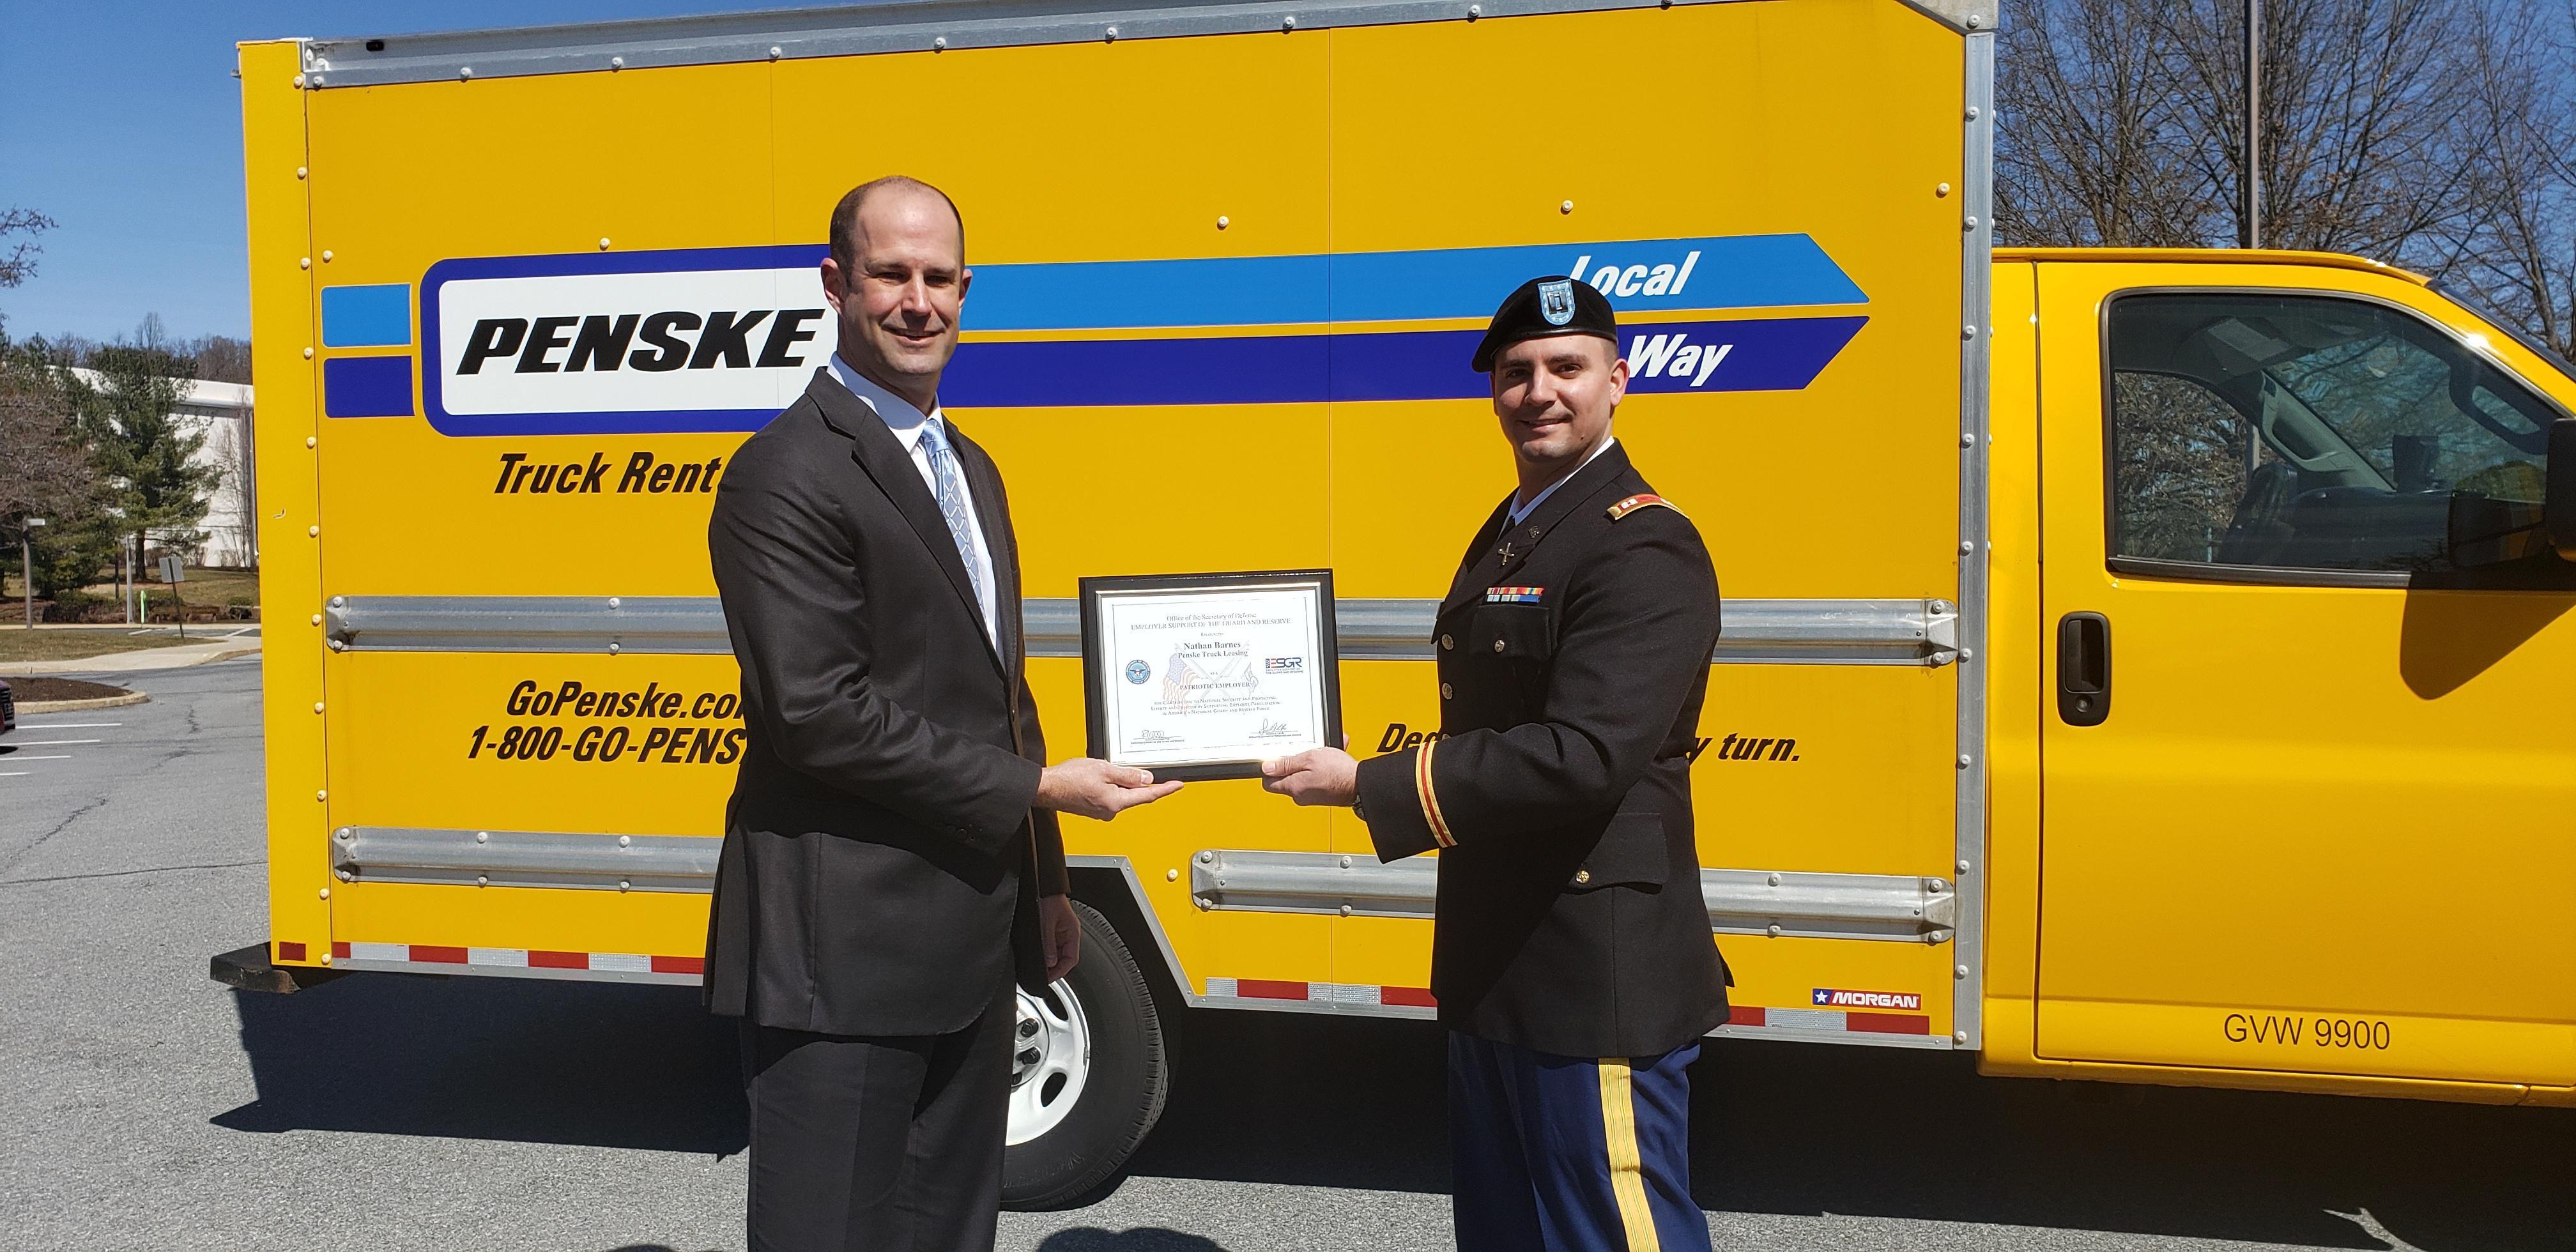 patriot award given in front of penske truck